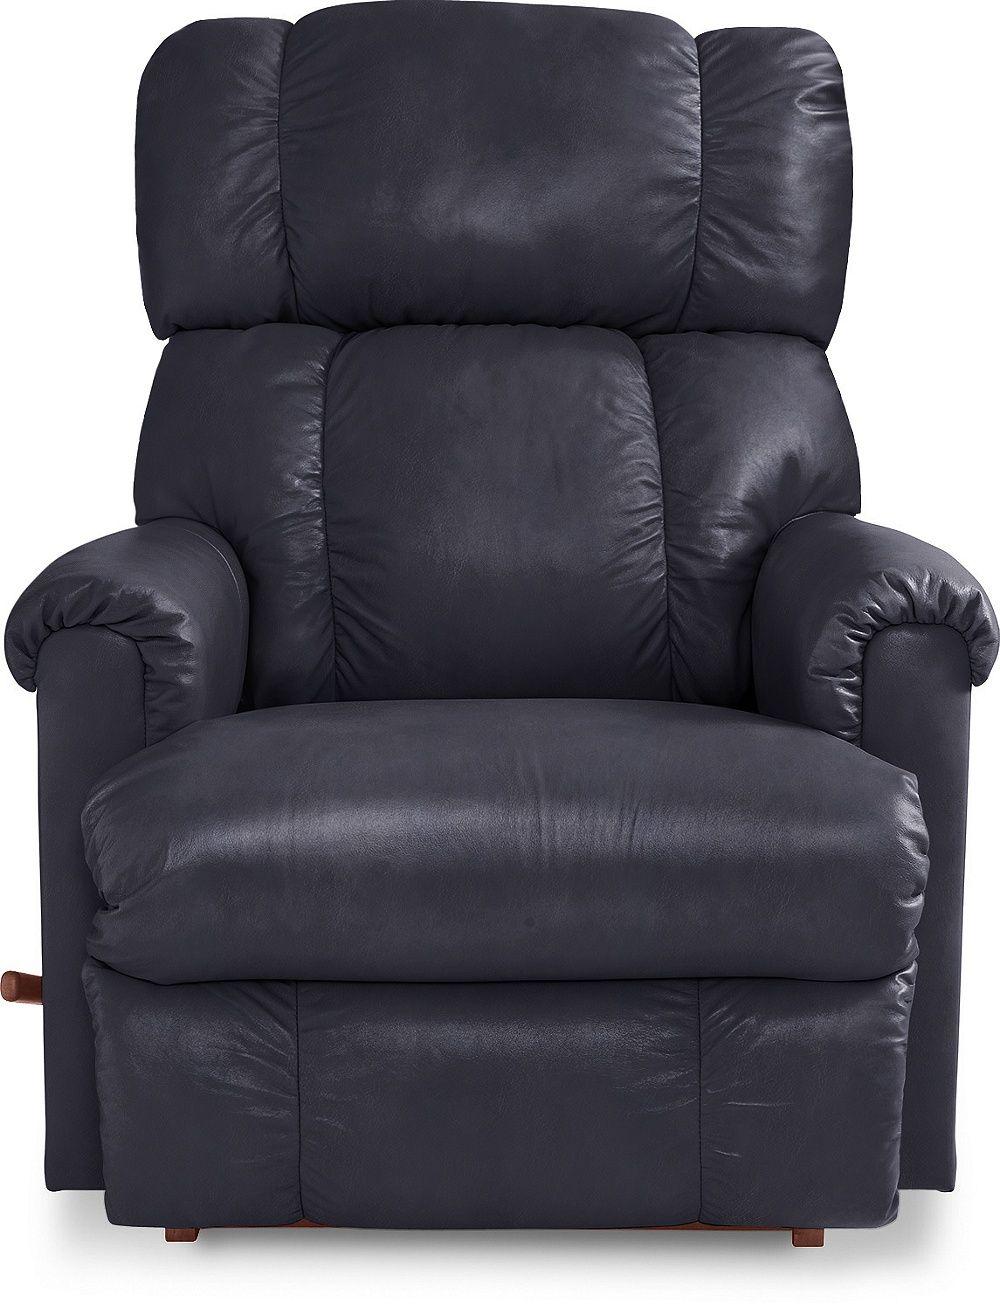 Pinnacle Wall Recliner Swivel Rocker Recliner Chair